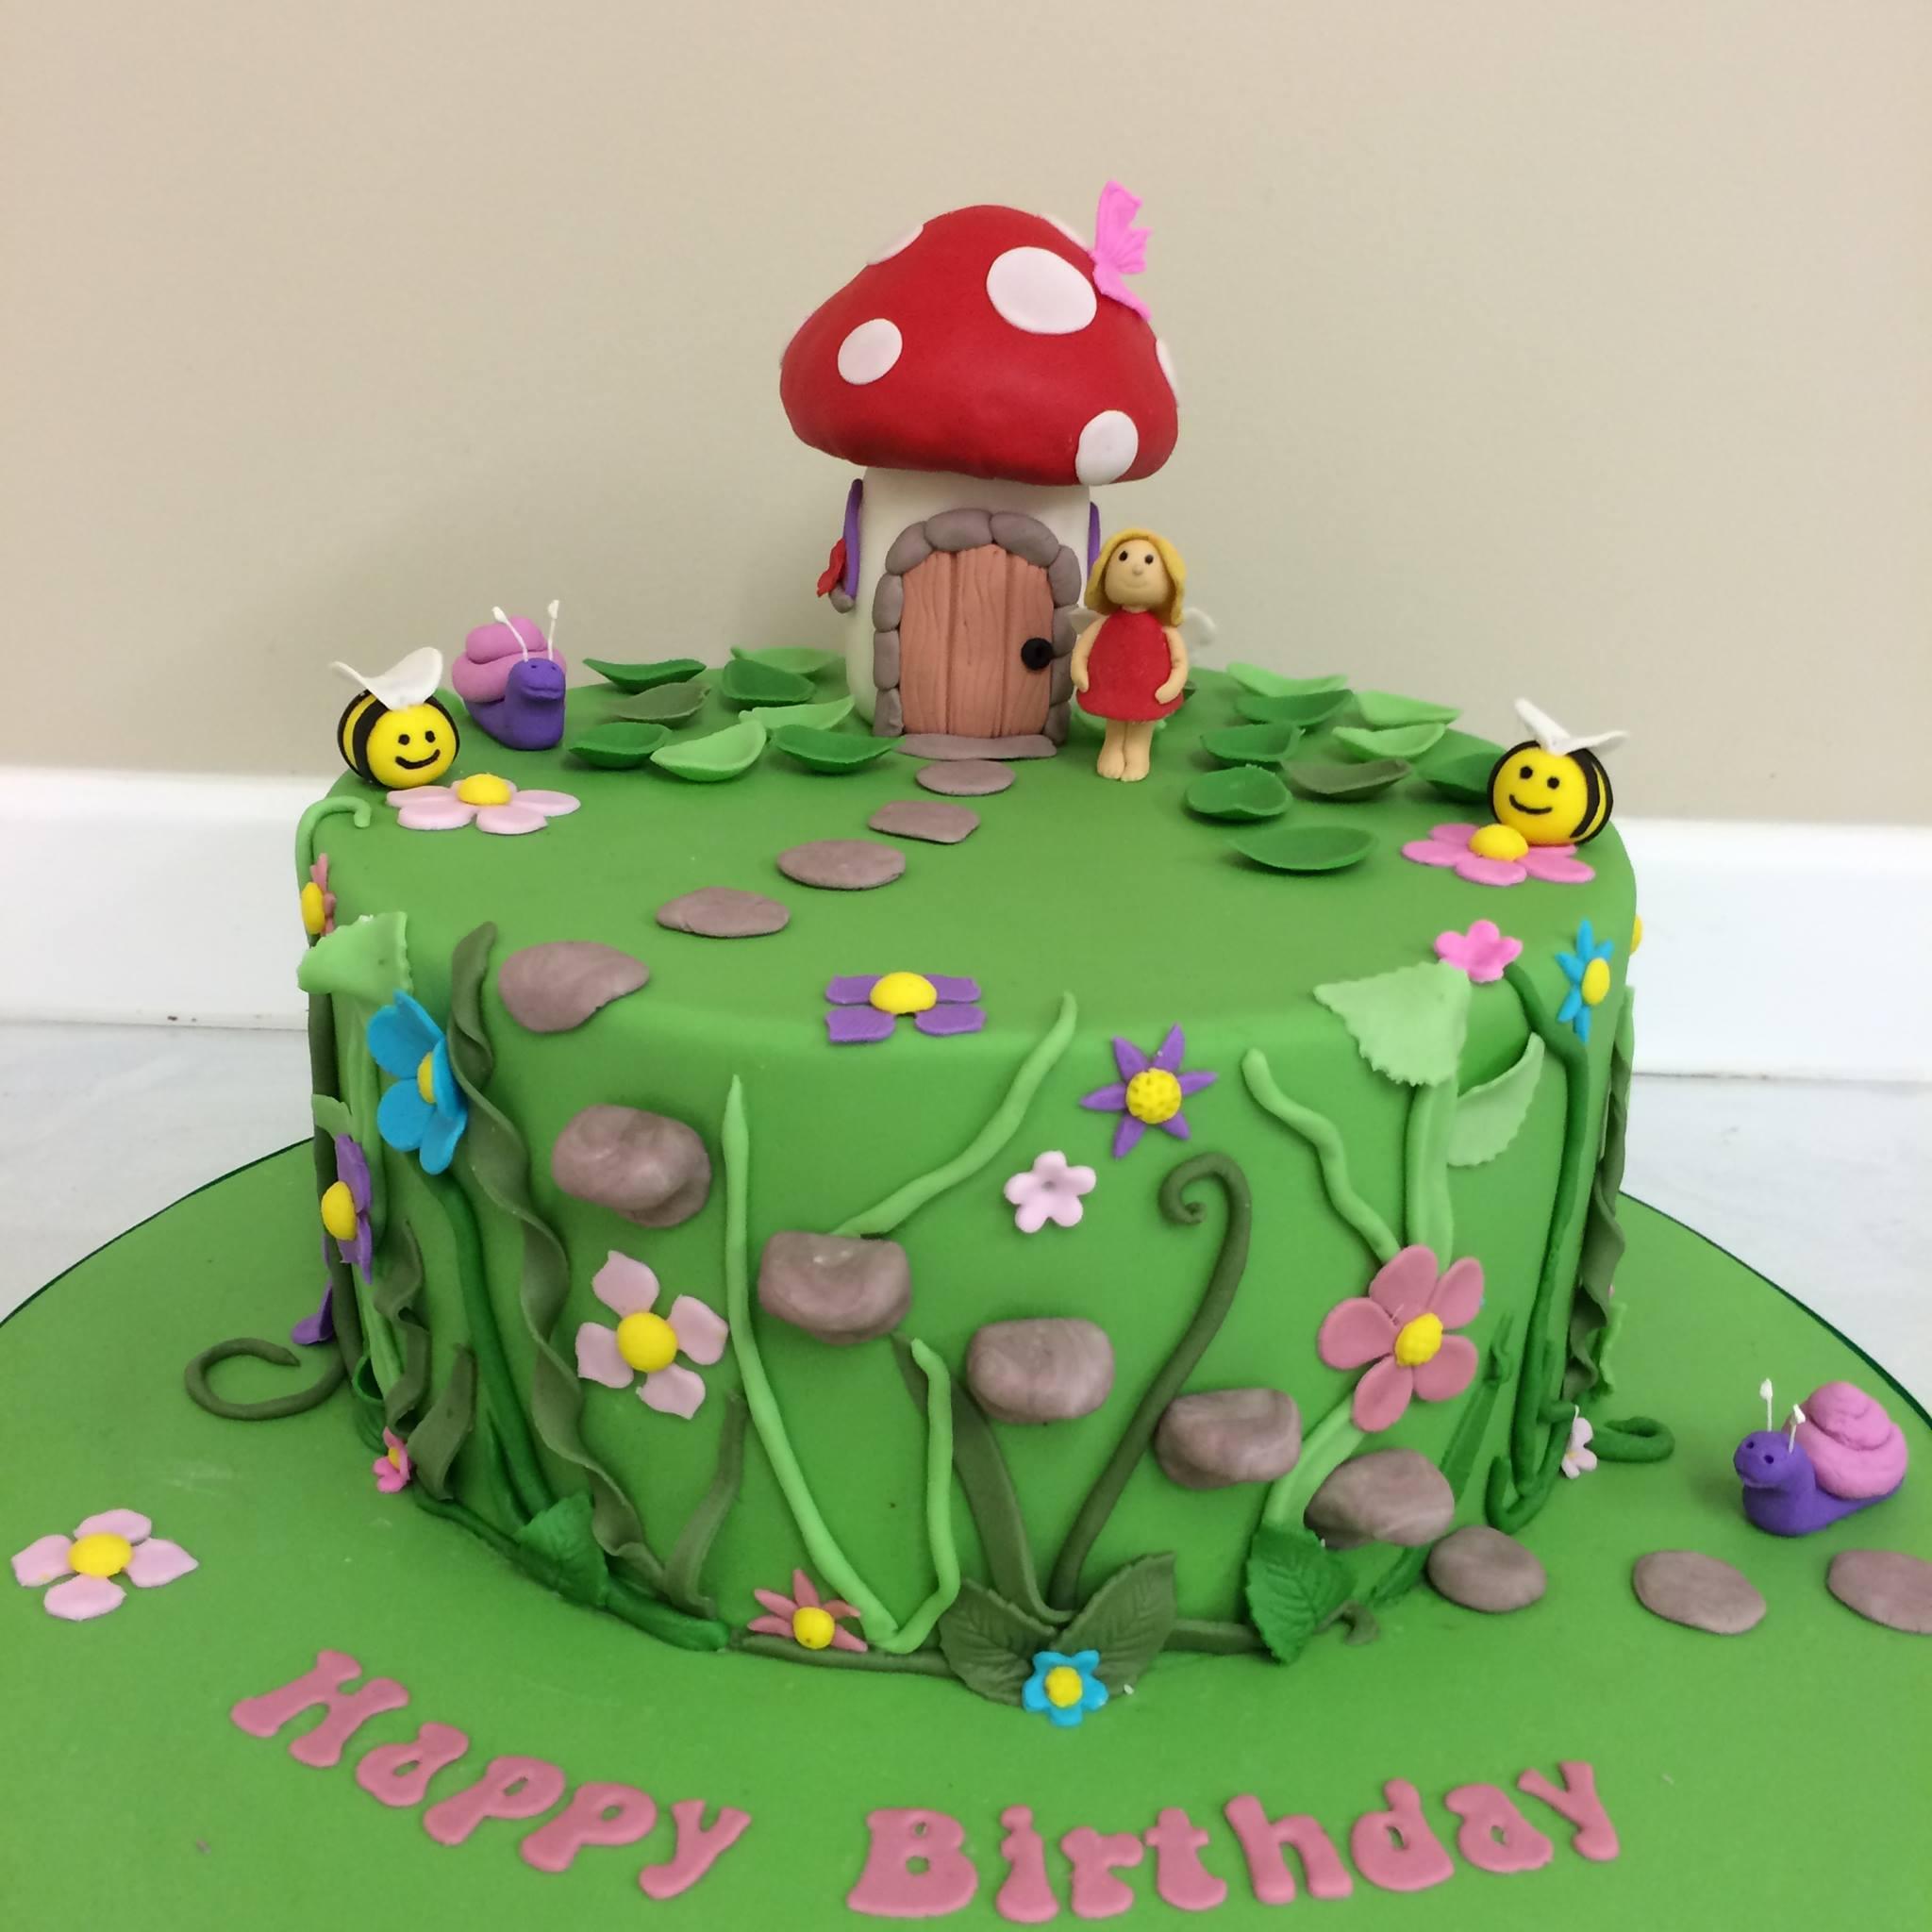 Fairy Garden Cake - SassyChics